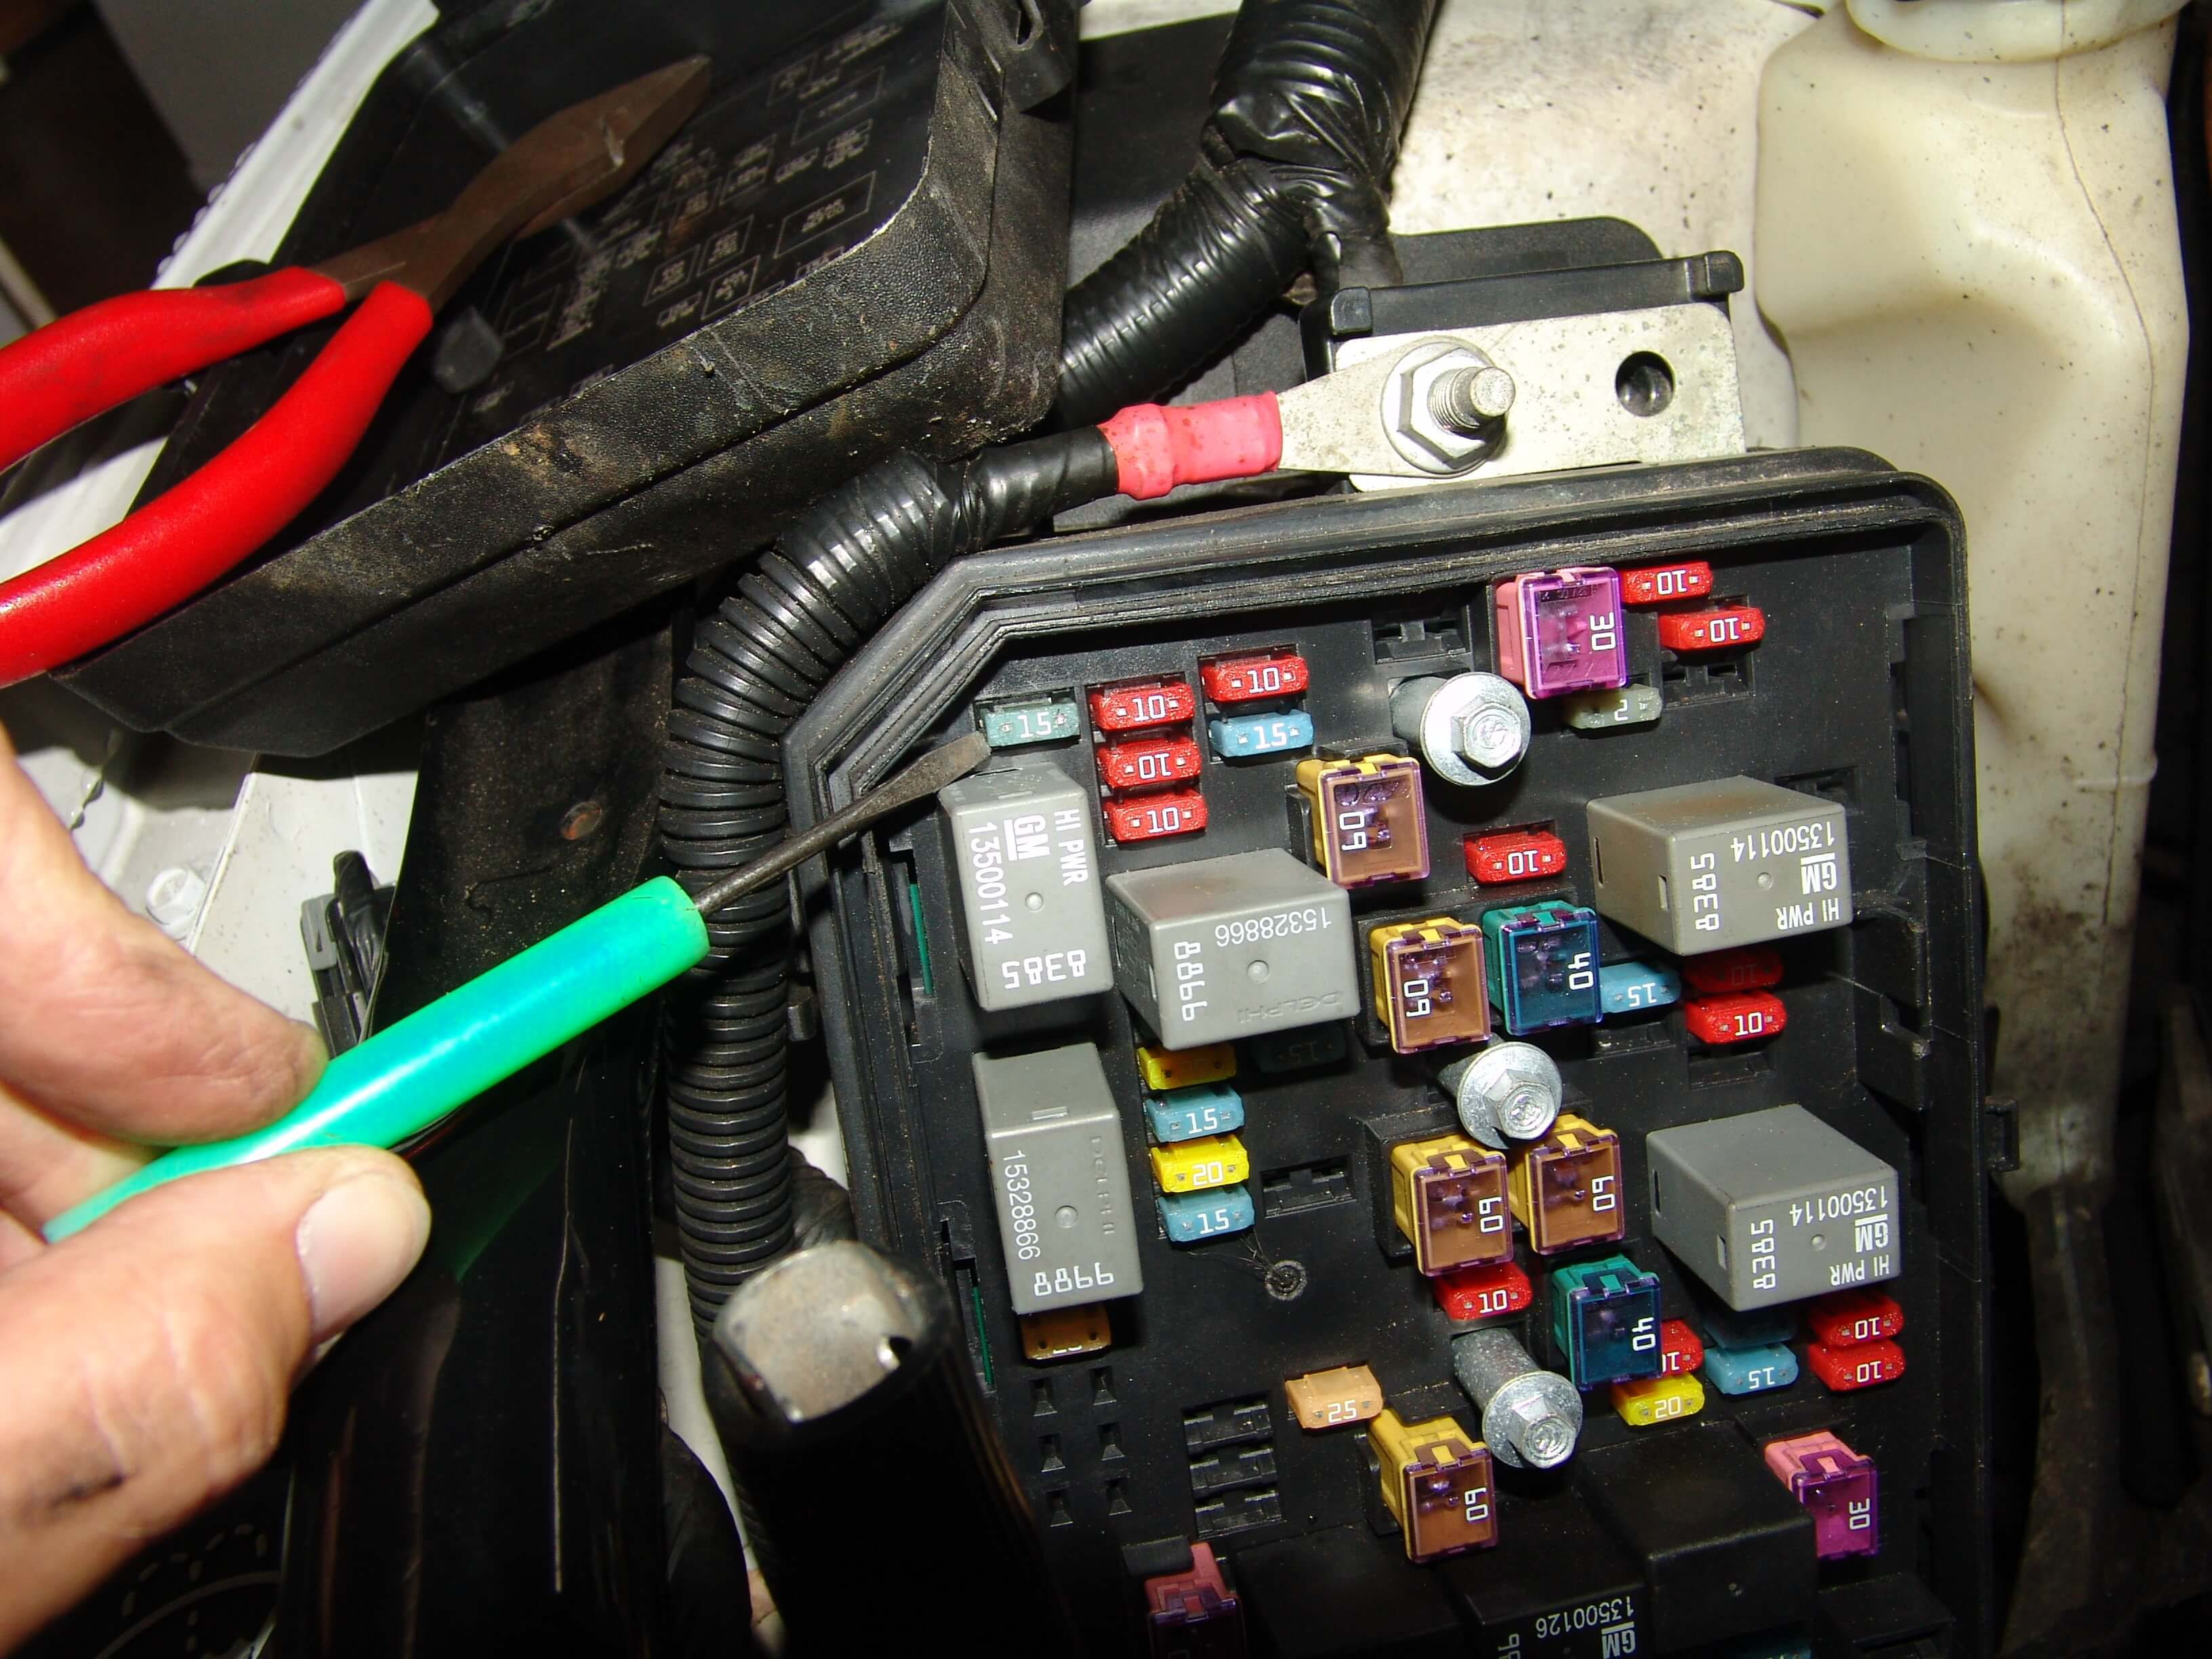 2011 chevrolet impala-fuel pump not working